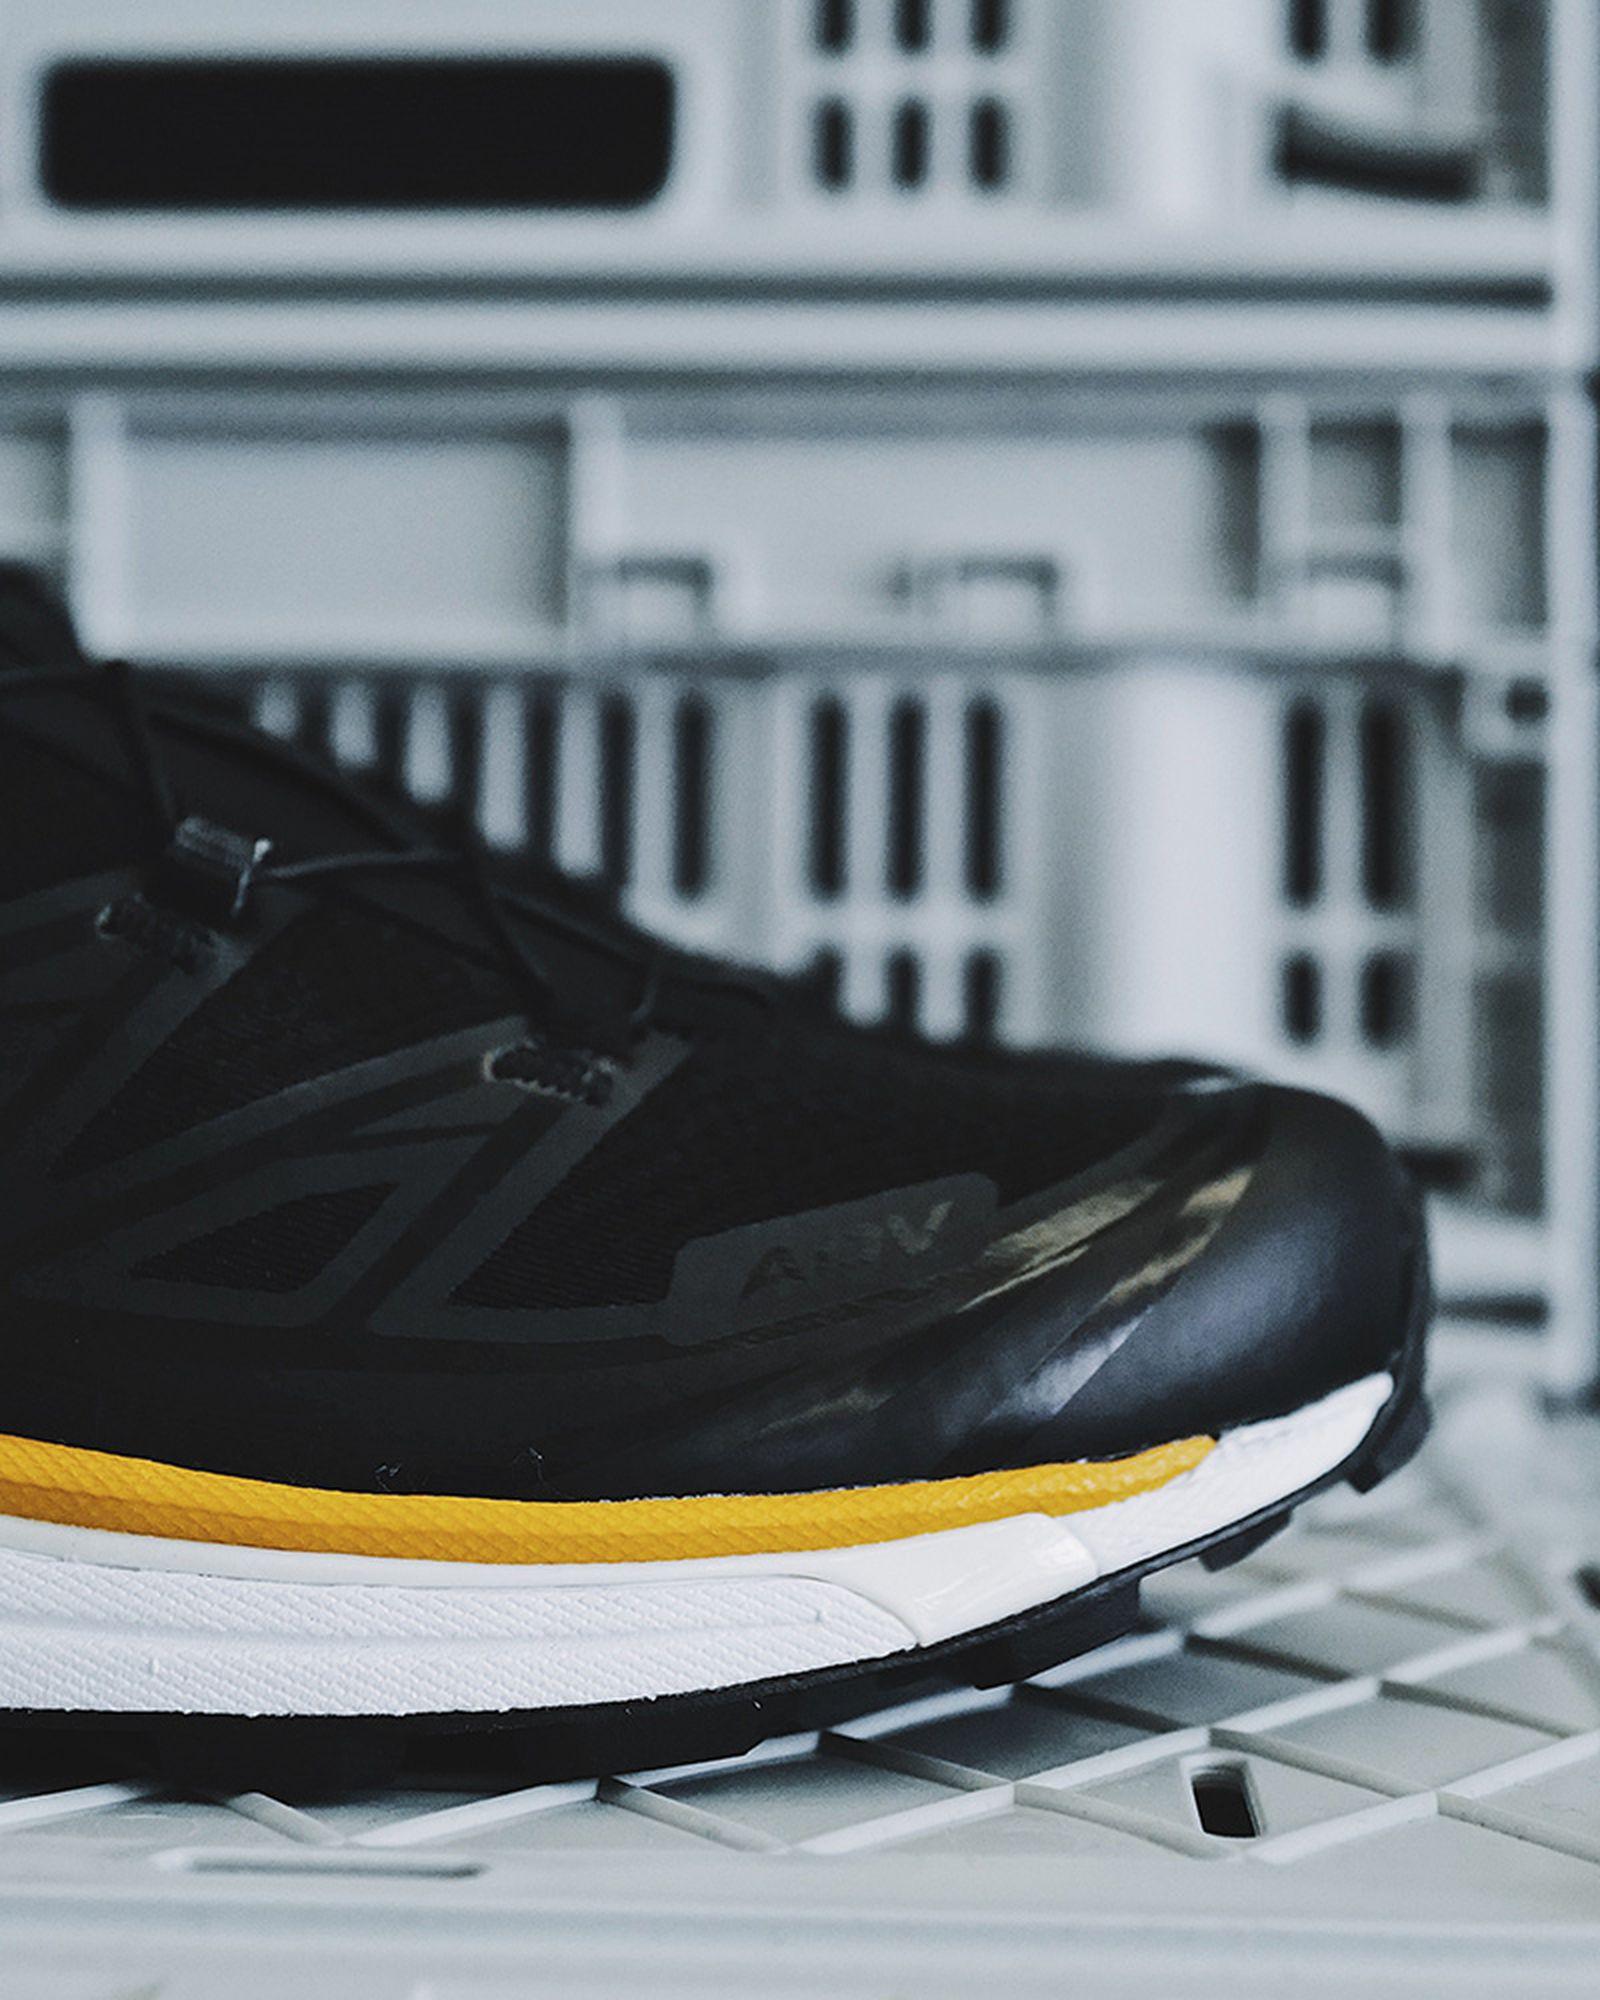 fumito ganryu salomon xt 6 adv release date price detail Louis Vuitton Nike OAMC